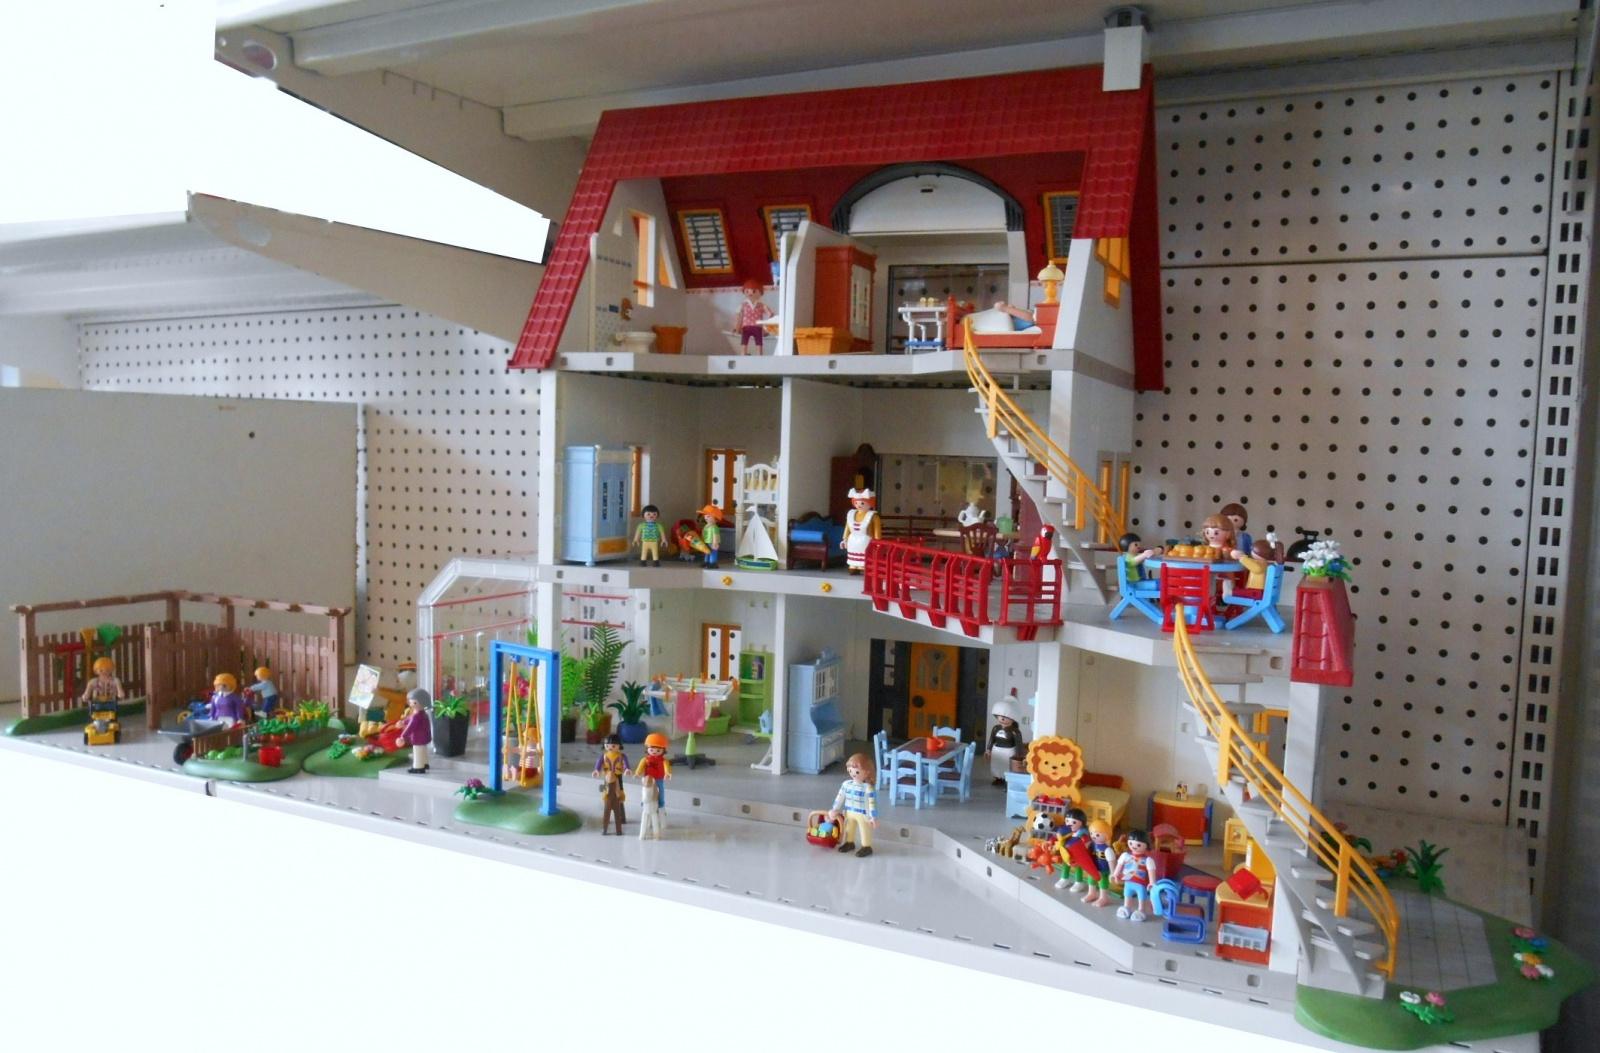 Playmobil Maison Moderne 4279 : Playmobil maison moderne extension stepindance